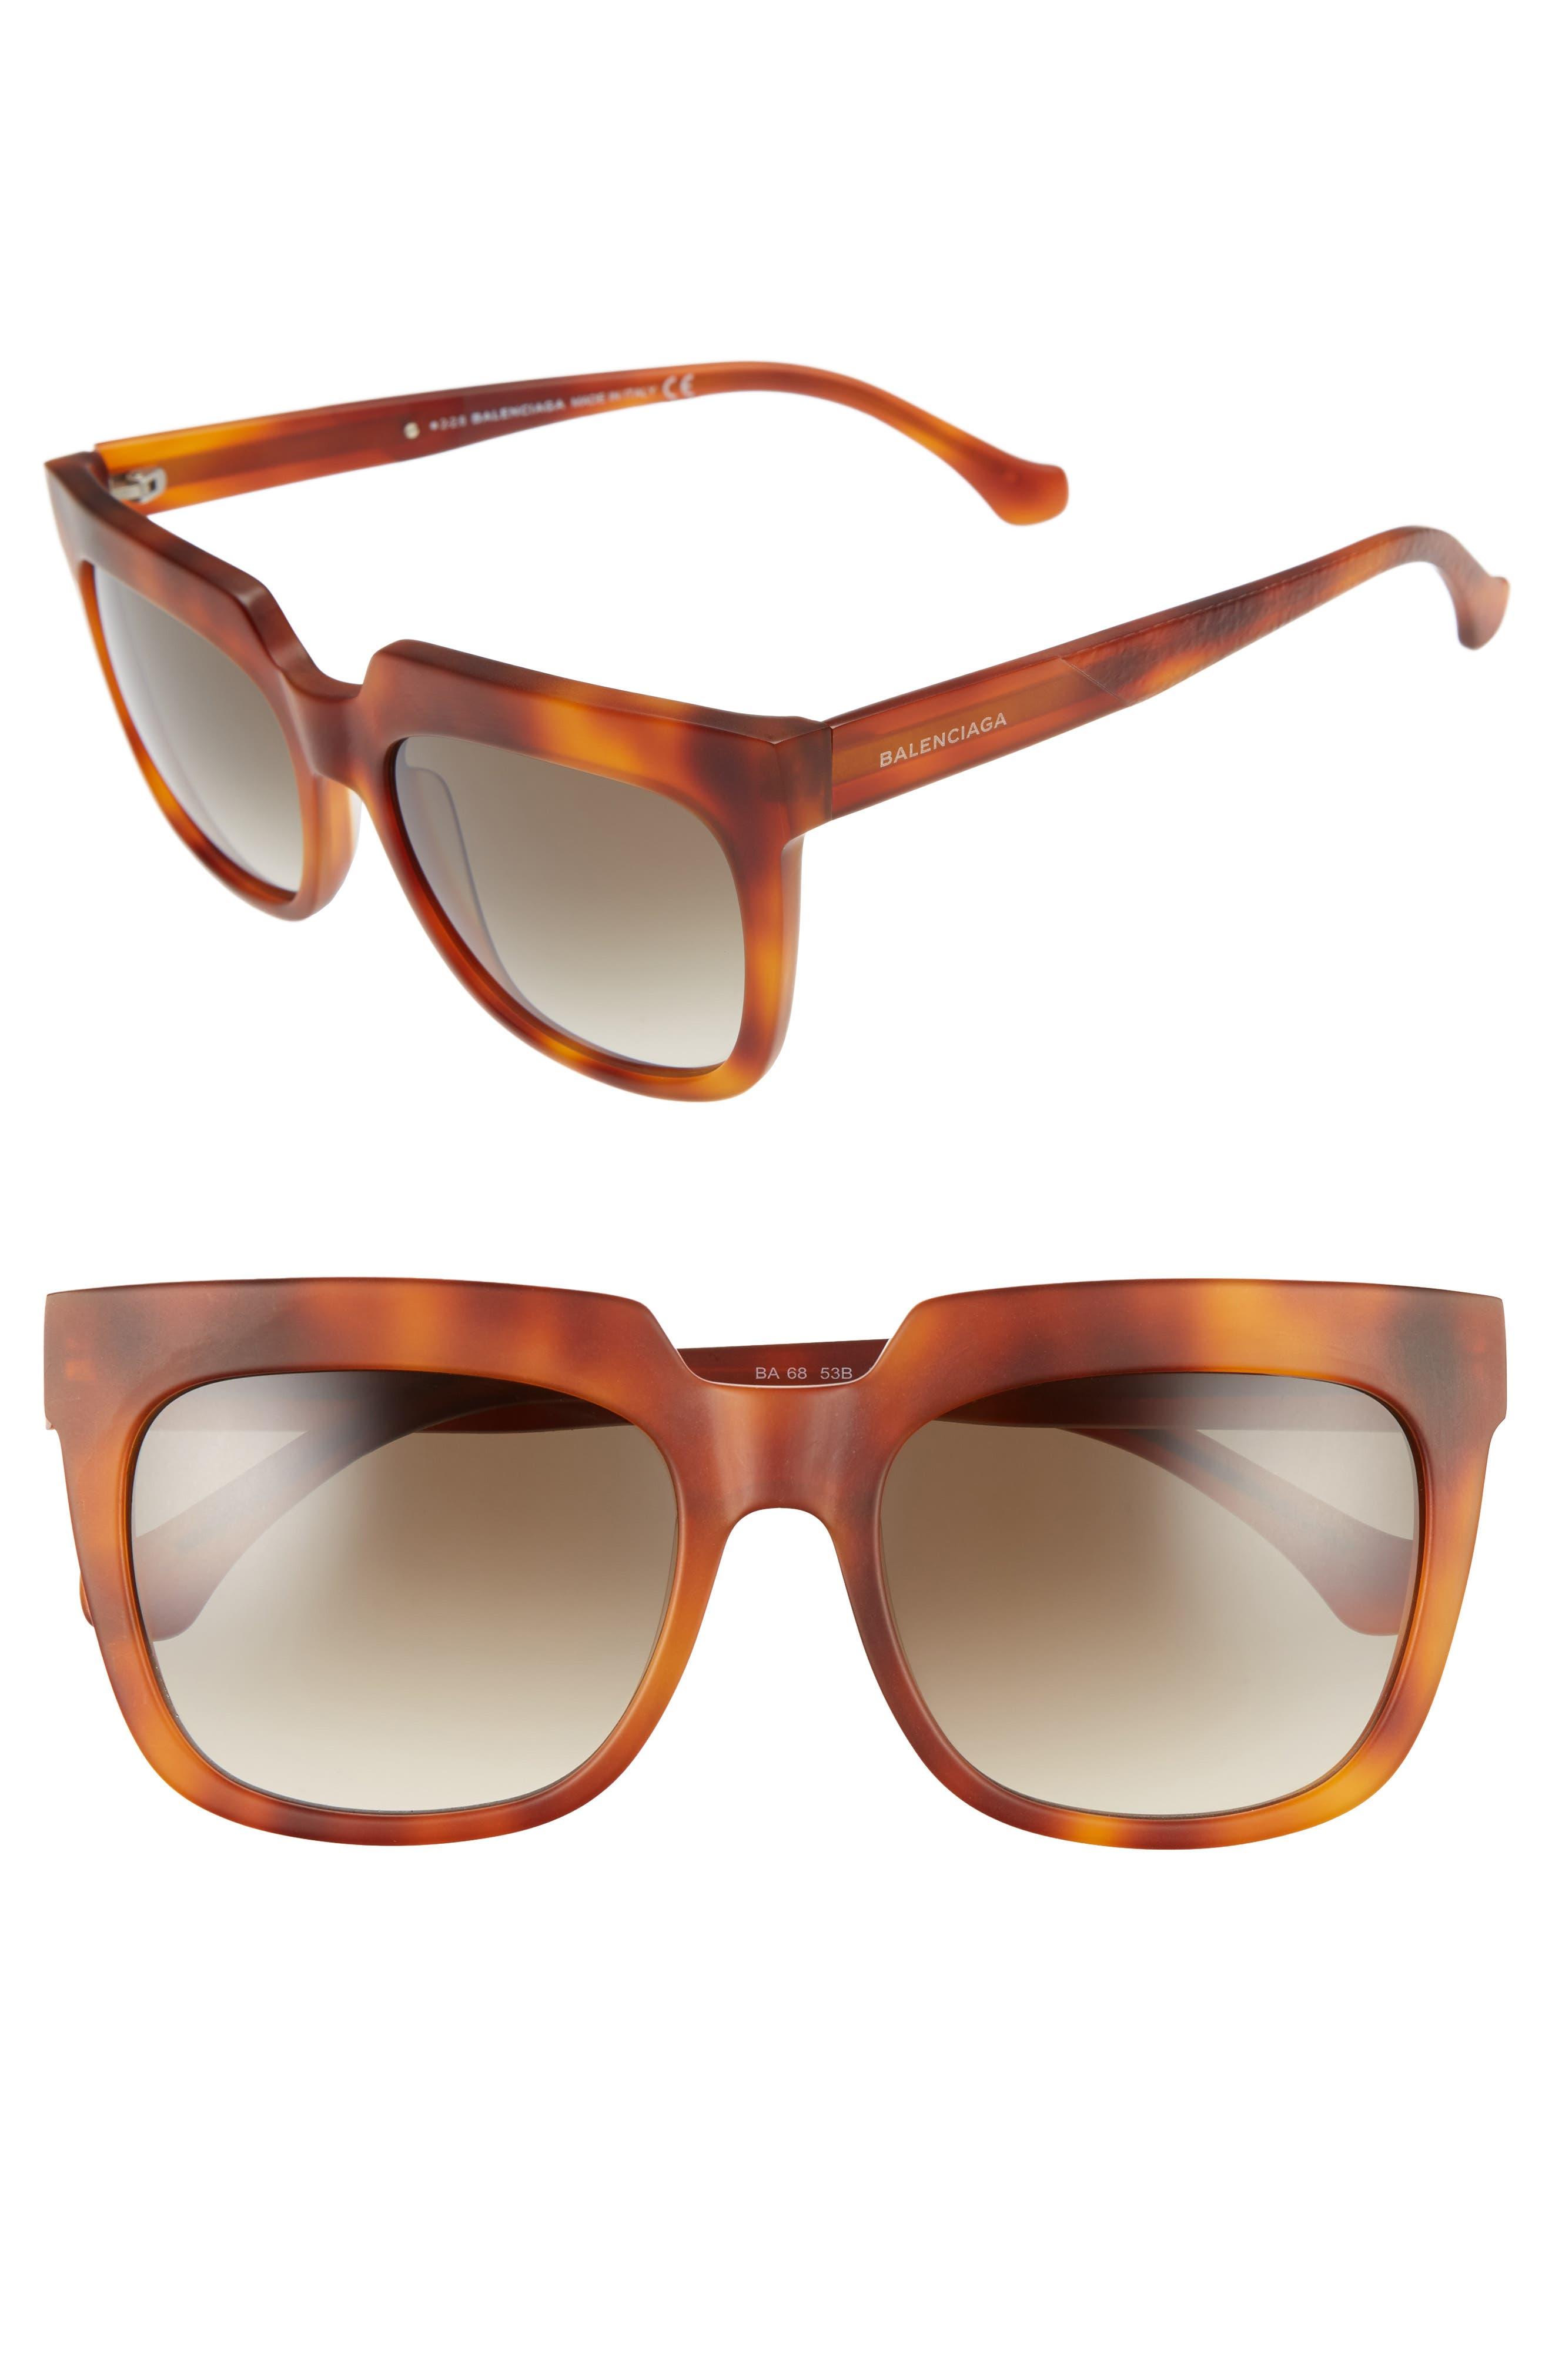 55mm Sunglasses,                             Main thumbnail 3, color,